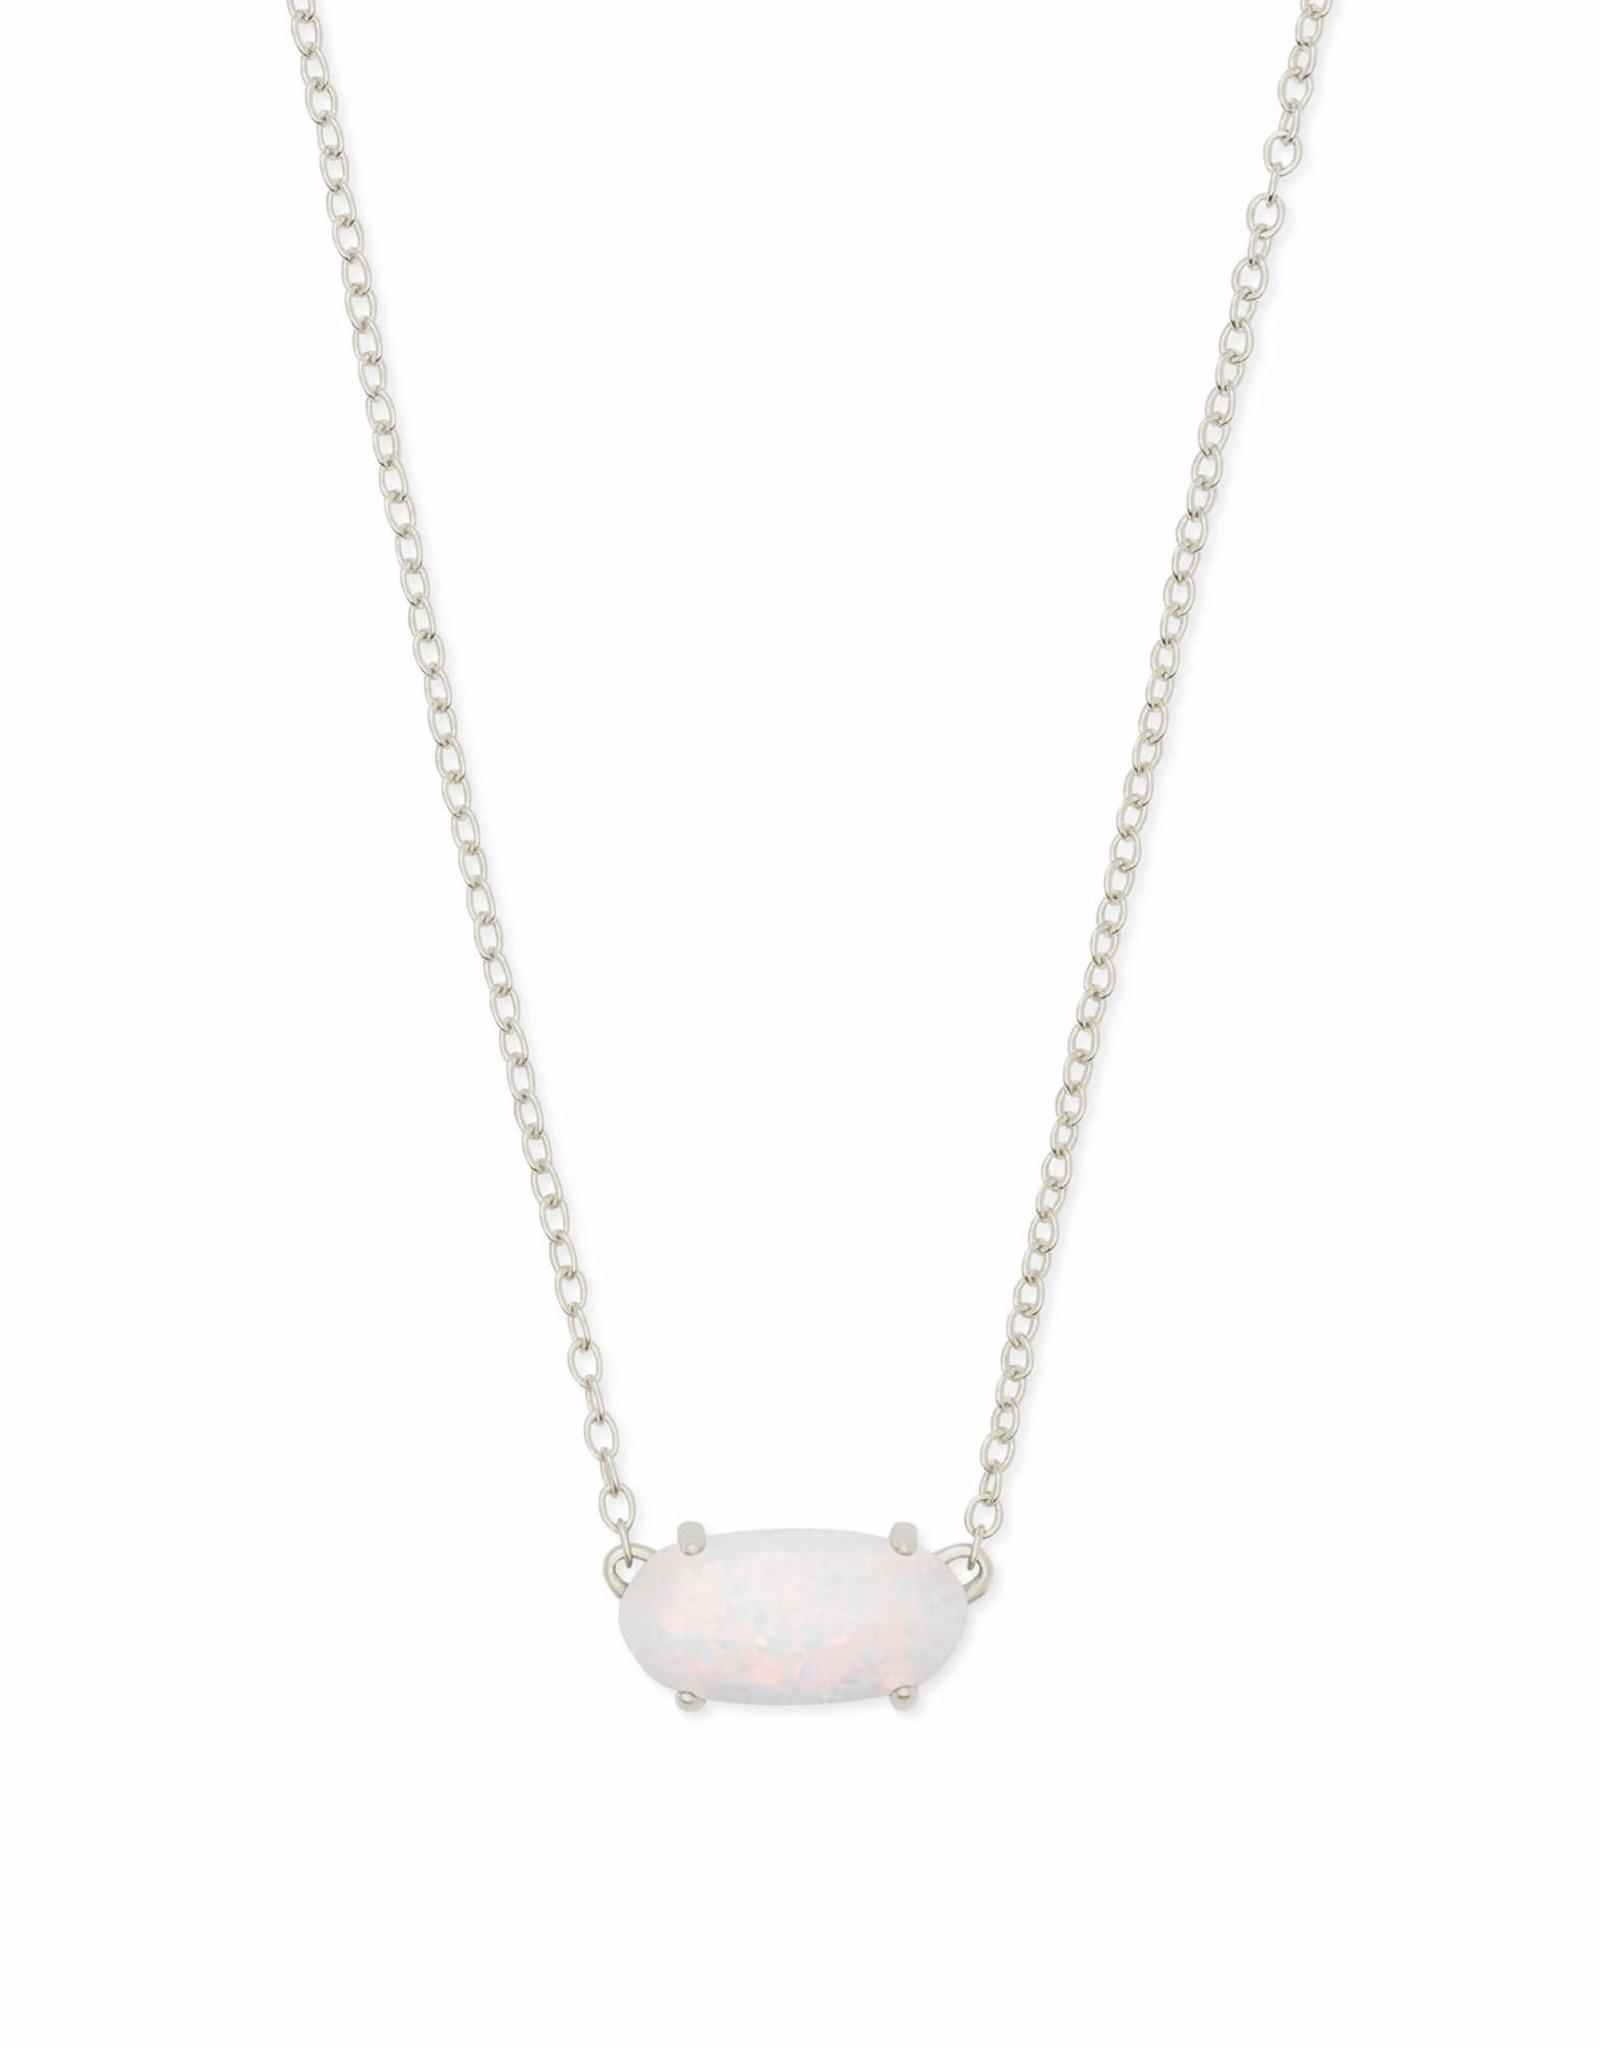 Kendra Scott Ever Necklace - White Opal/Rhodium